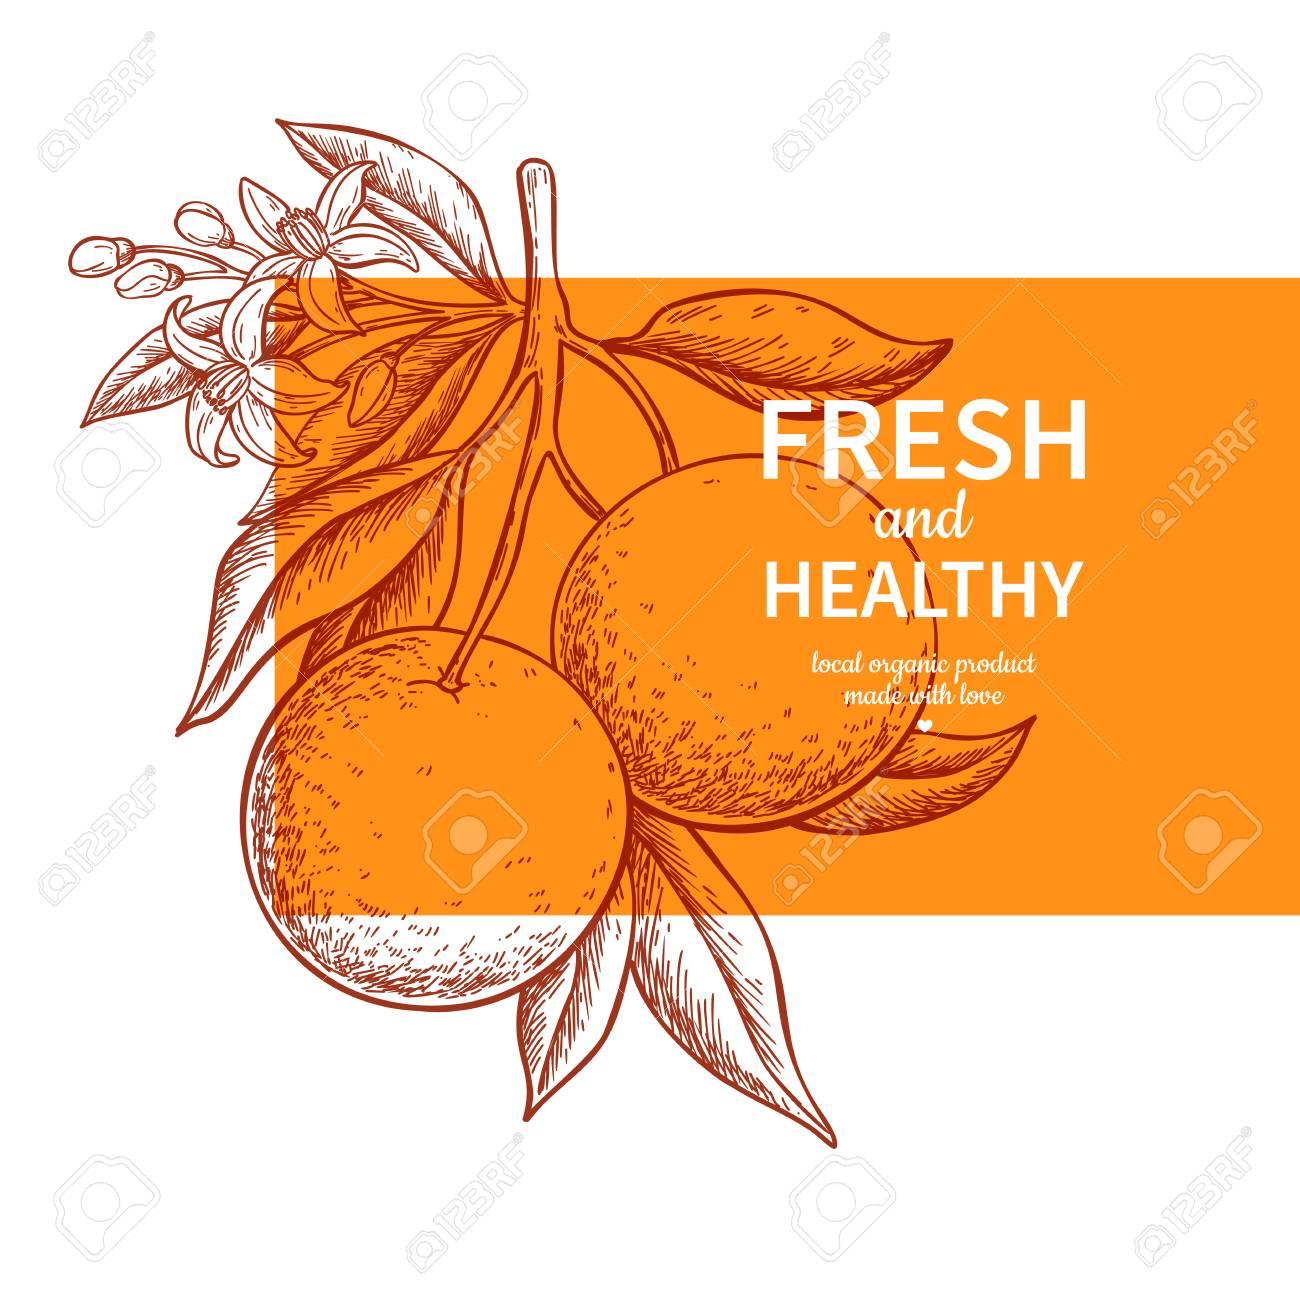 Orange label vector drawing. Citrus fruit engraved template. Hand drawn summer illustration. Vintage banner, product packaging, design concept. Tropical juice poster, grapefruit sign - 118839732